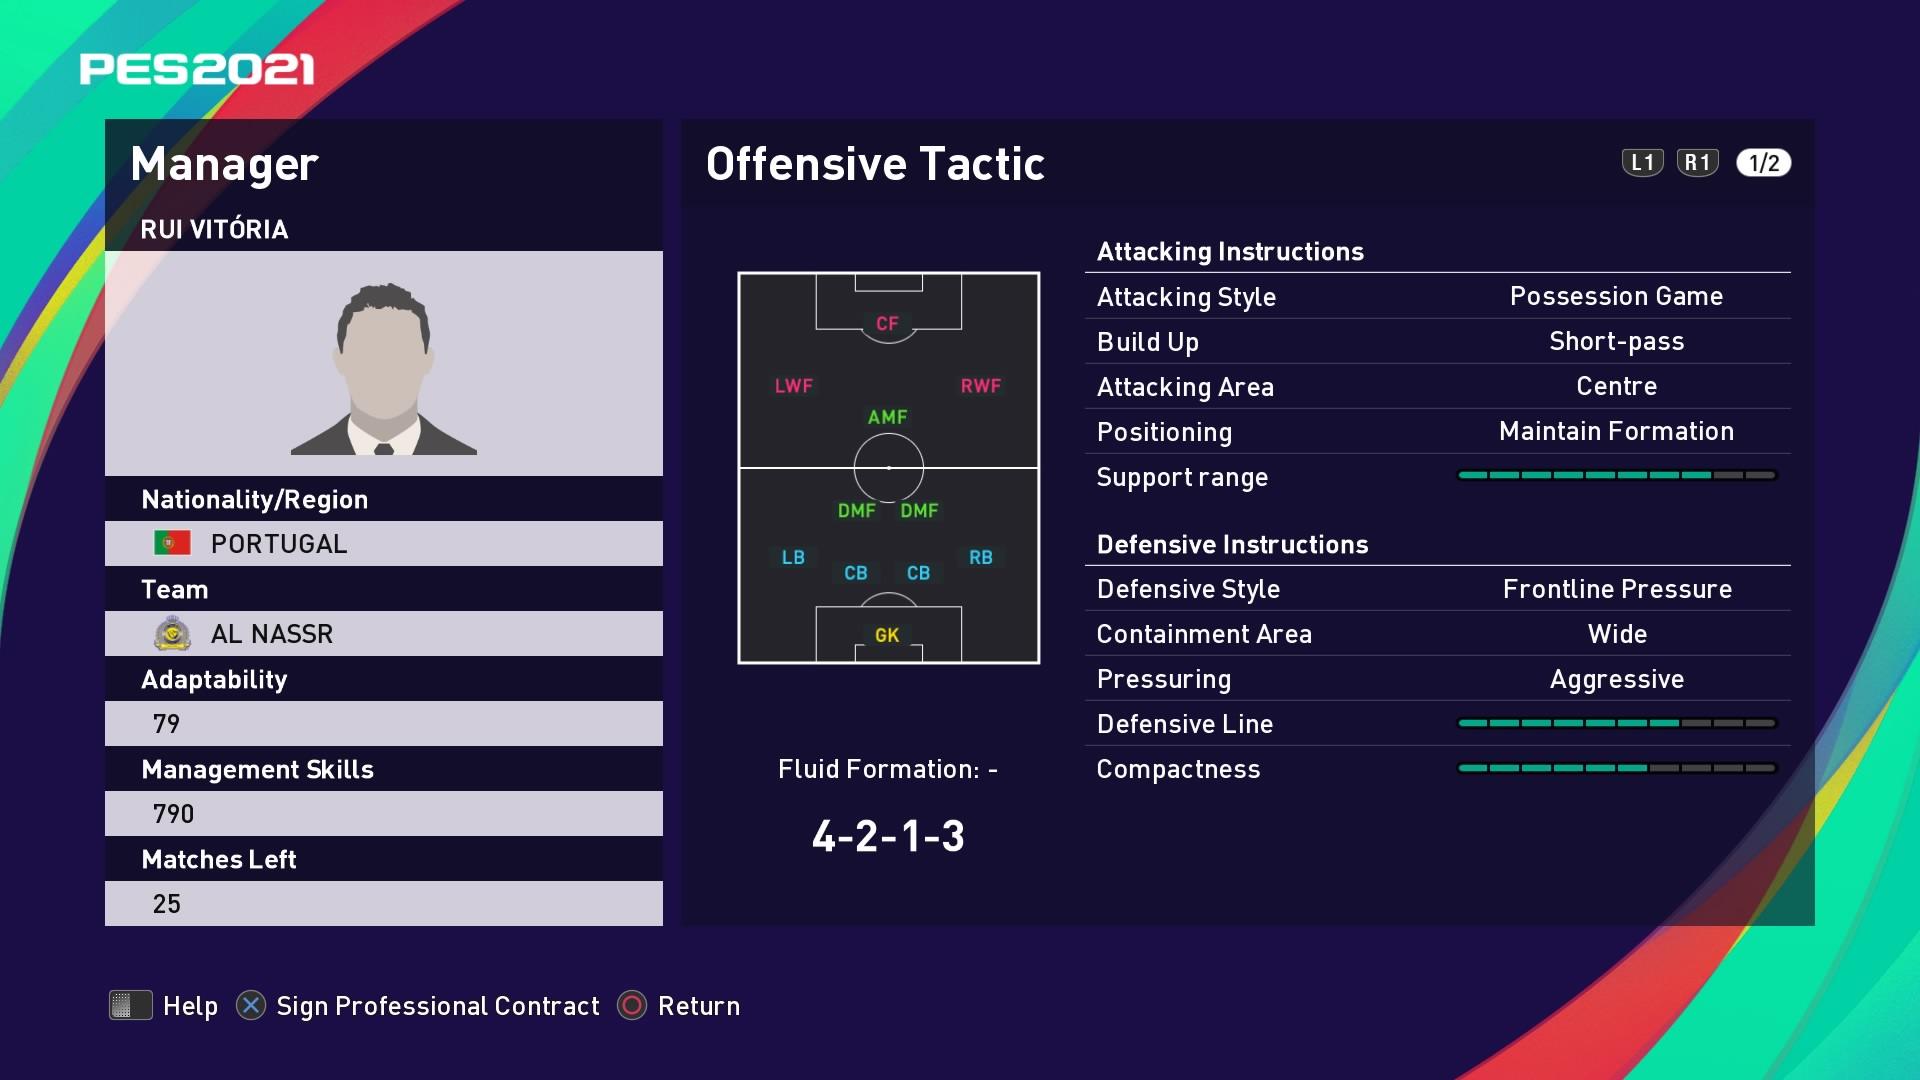 Rui Vitória Offensive Tactic in PES 2021 myClub